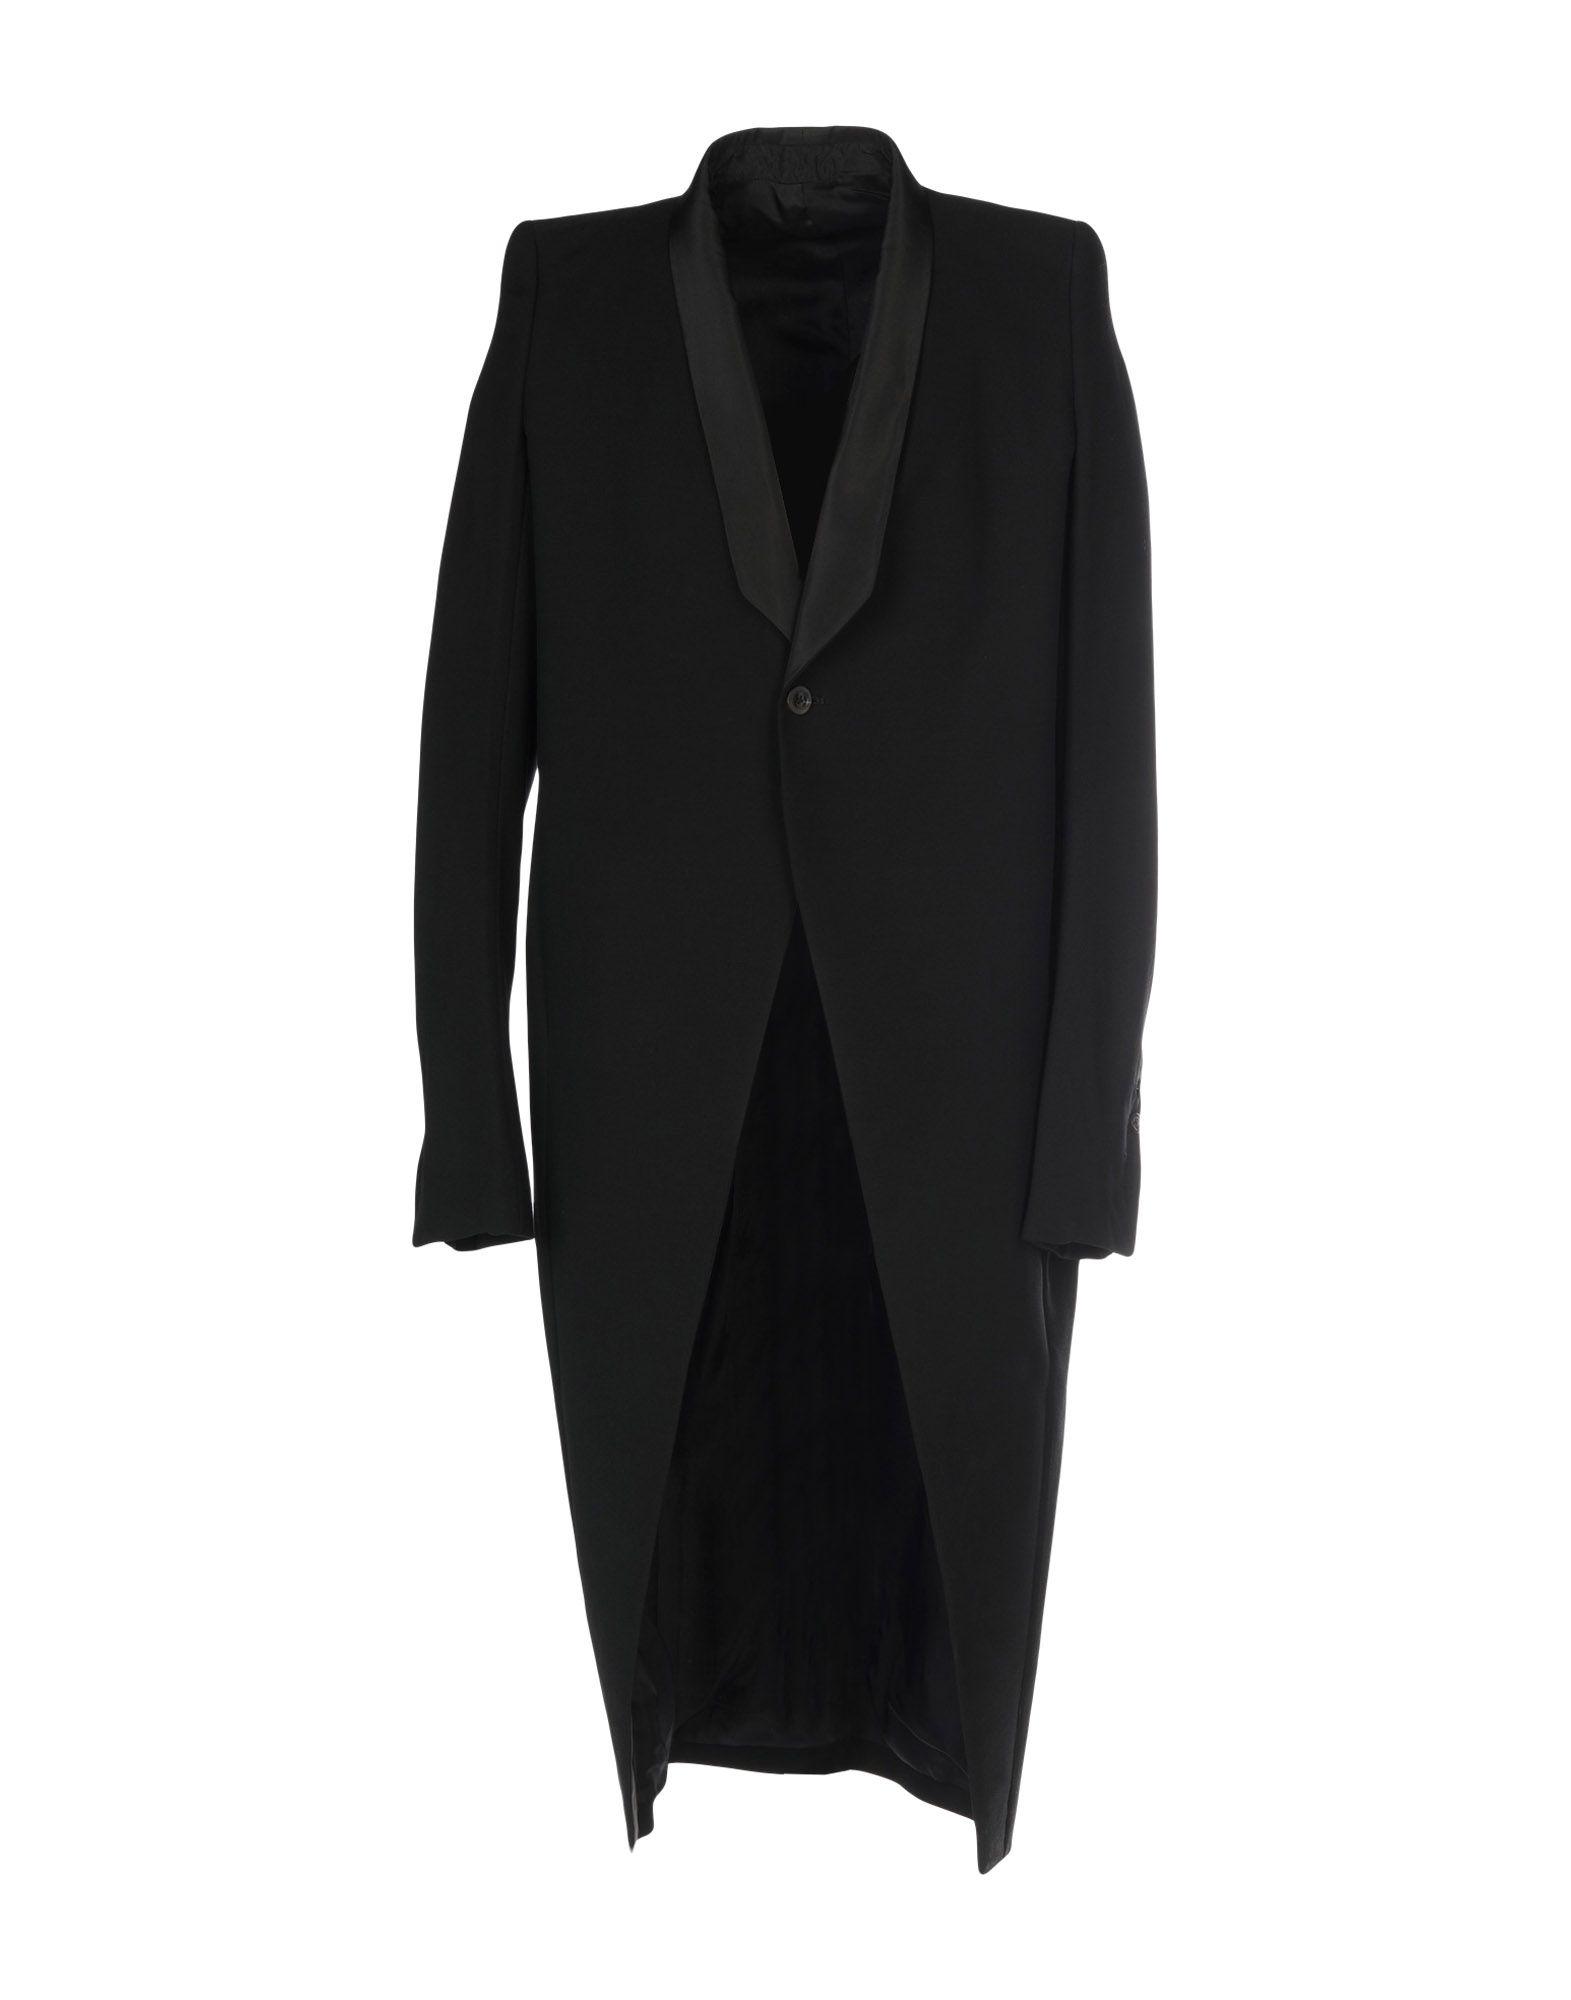 e6a73e0b9a2bea men s fashion for sale - Discount store for men - Cheap outlet ...